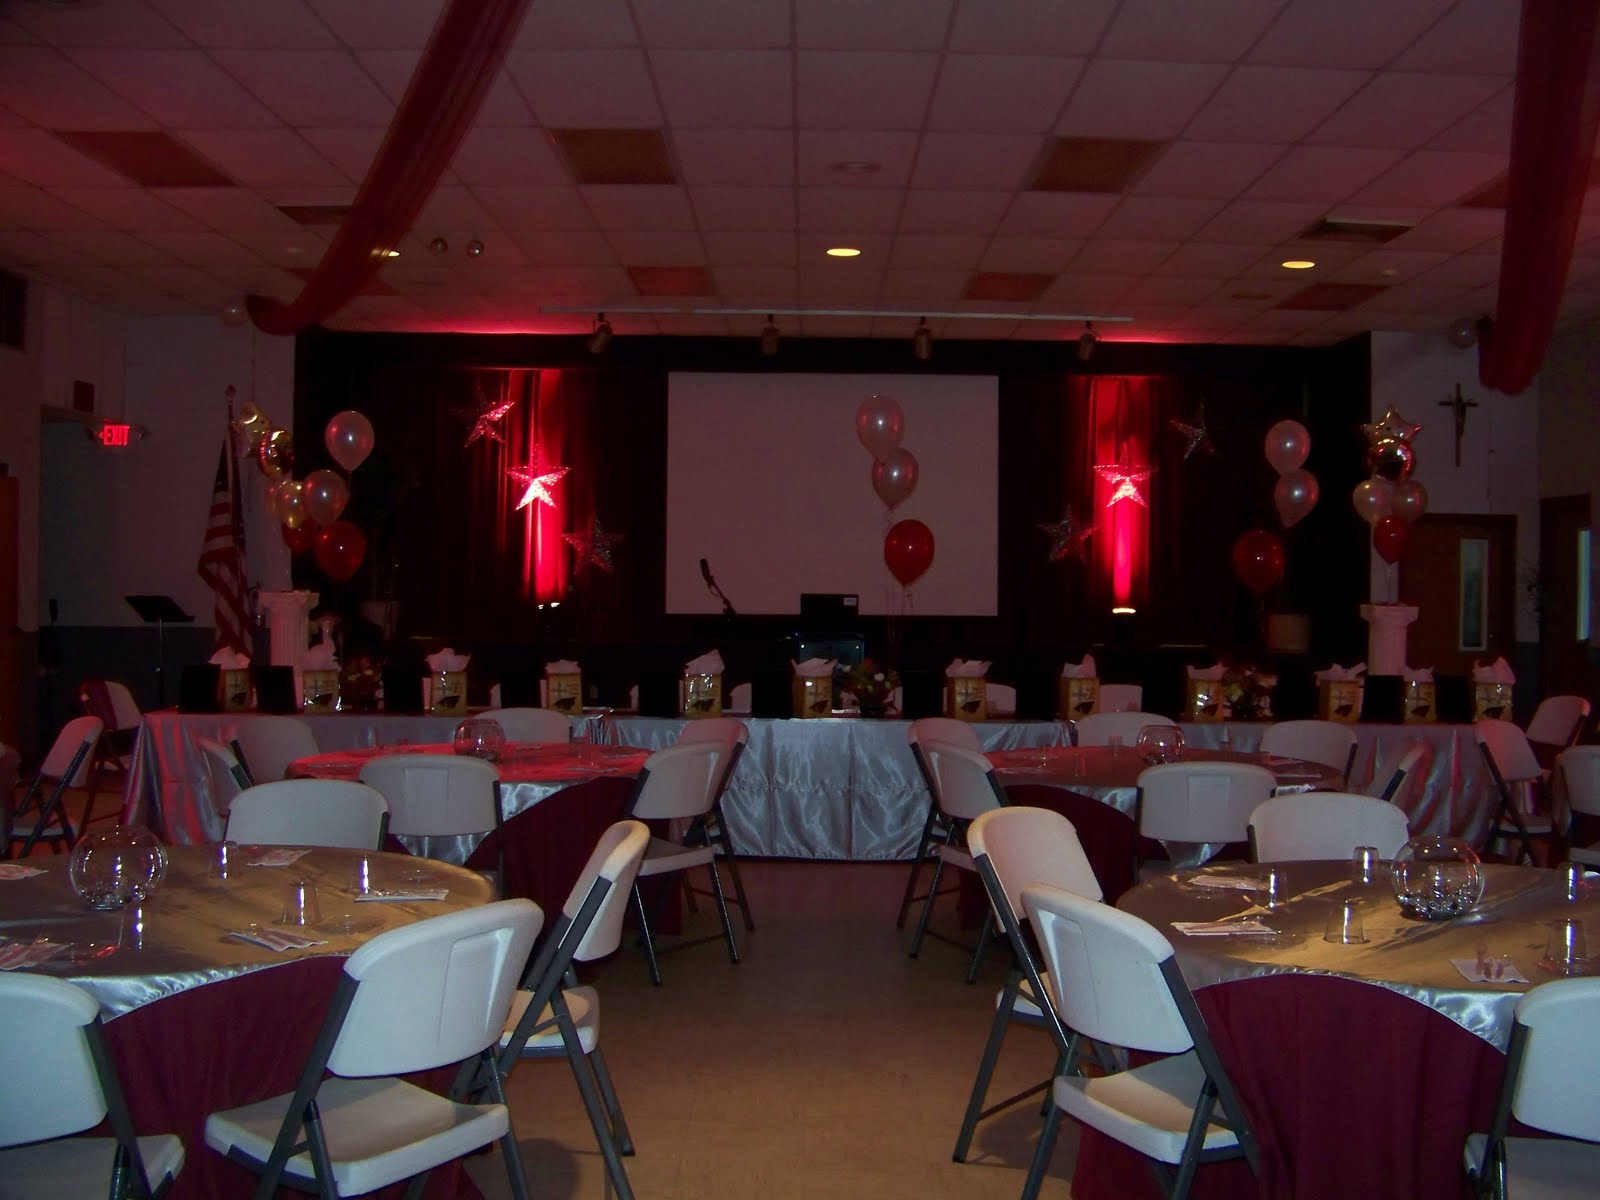 graduation party ideas: 8th grade graduation party themes ideas